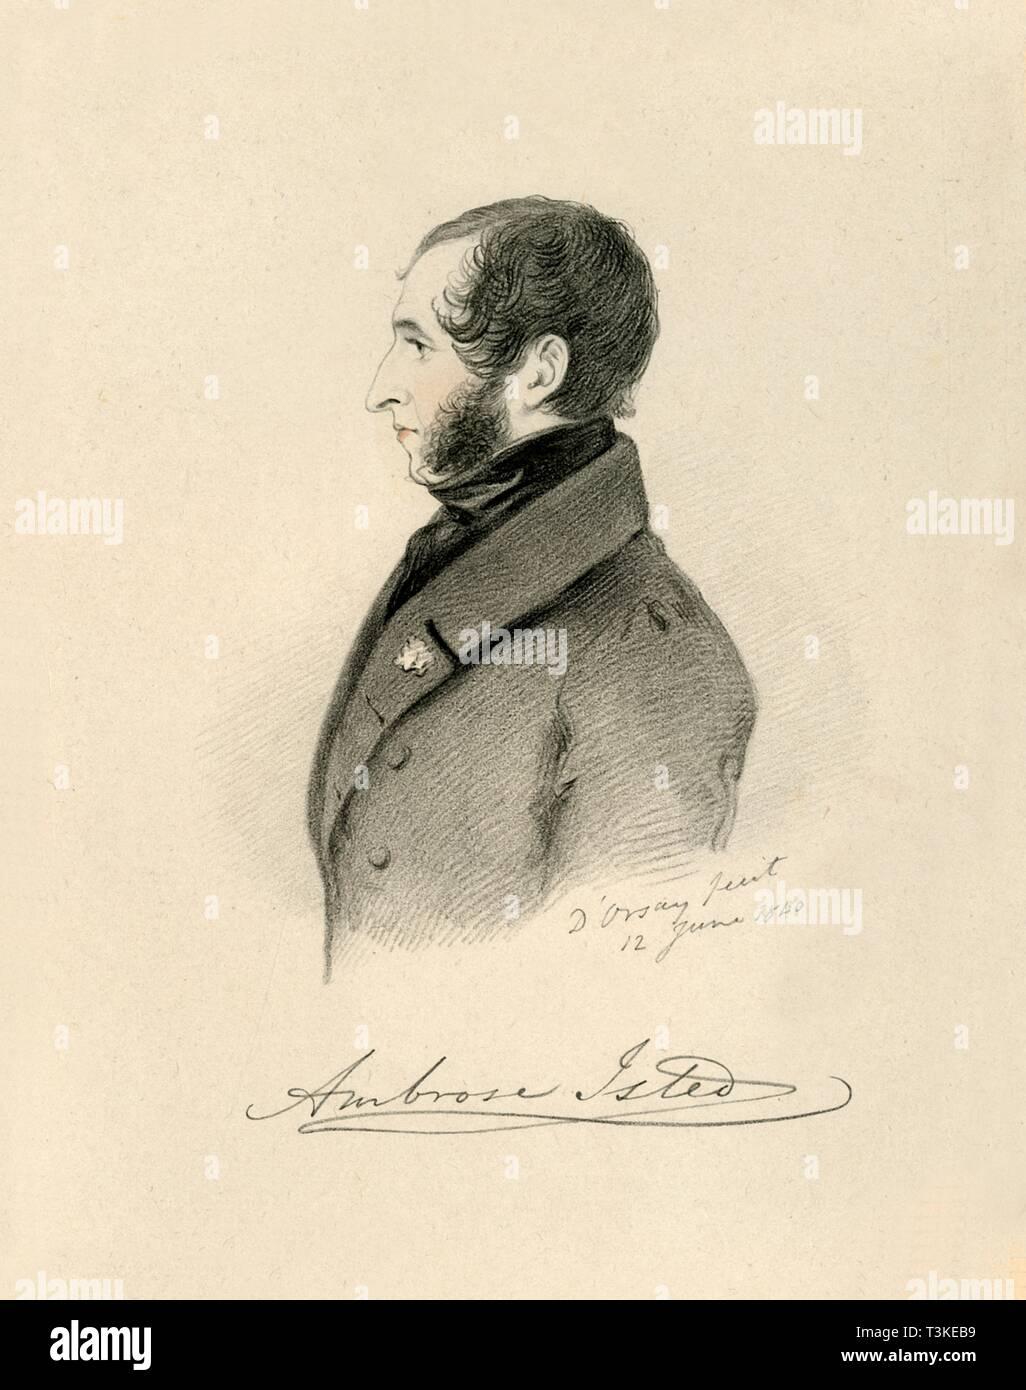 'Ambrose Isted', 1840. Creator: Richard James Lane. - Stock Image